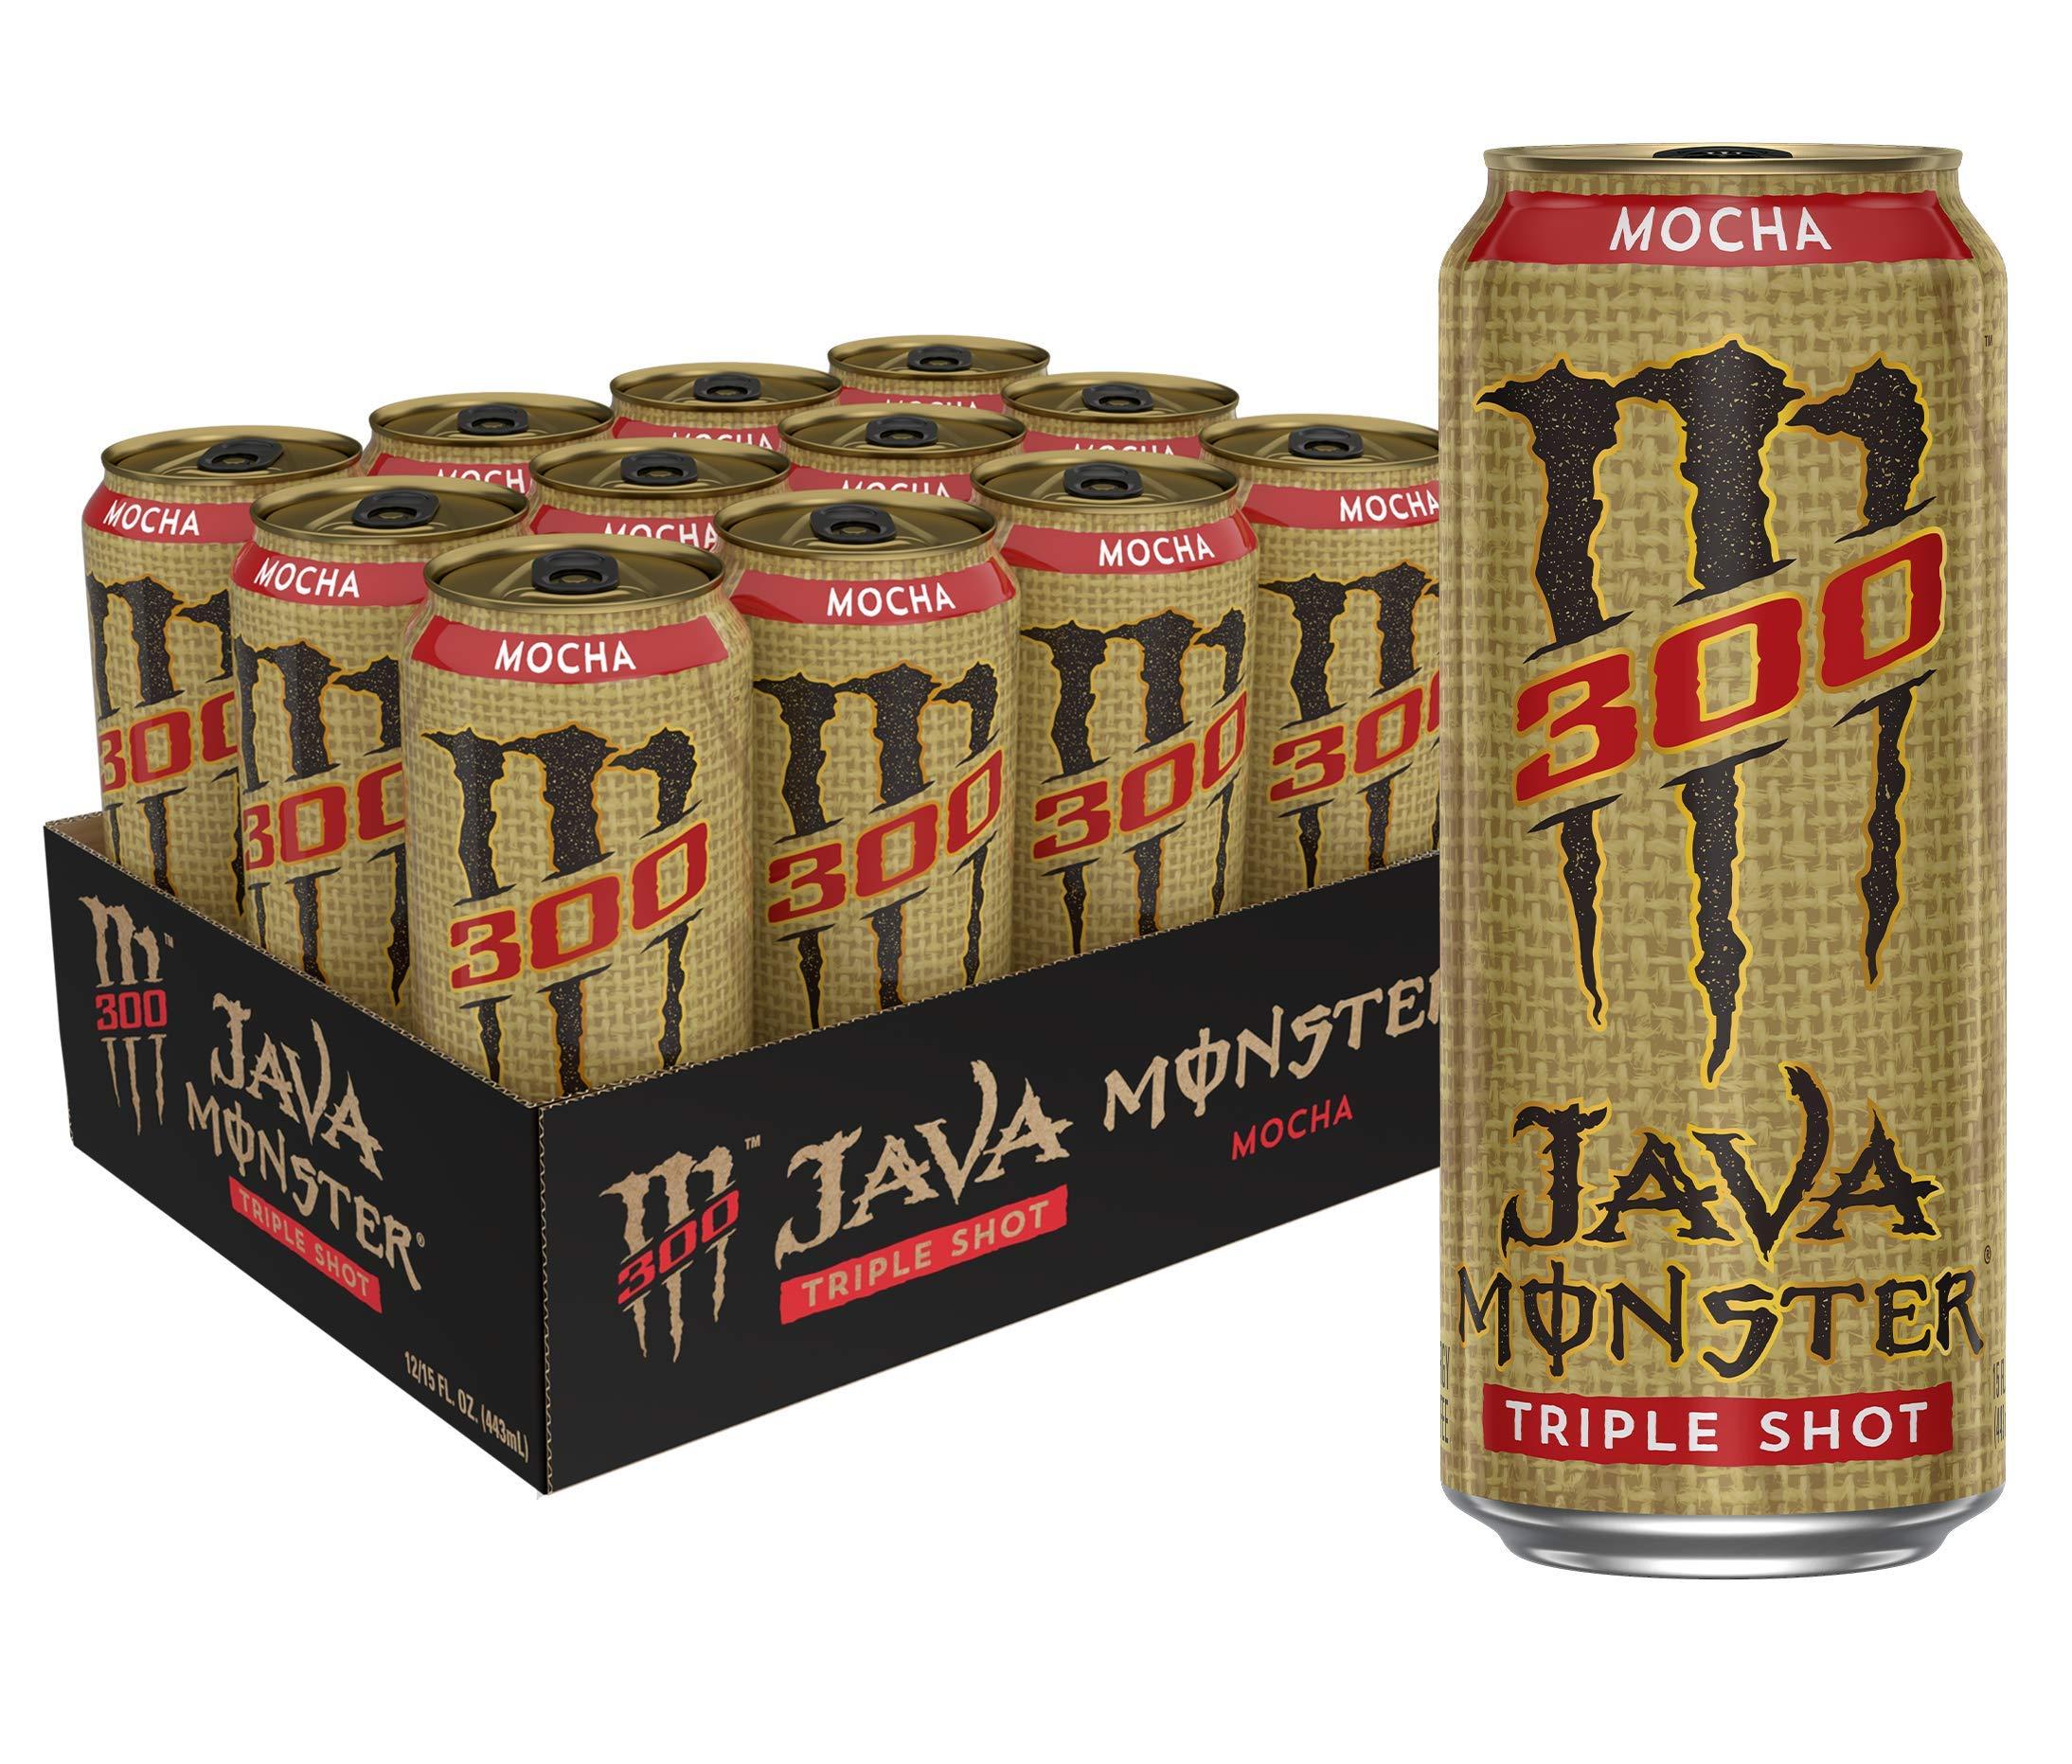 Monster Energy Java 300 Triple Shot Robust Coffee + Cream 15 Oz Pack, Mocha, 180 Fl Oz, Pack of 12